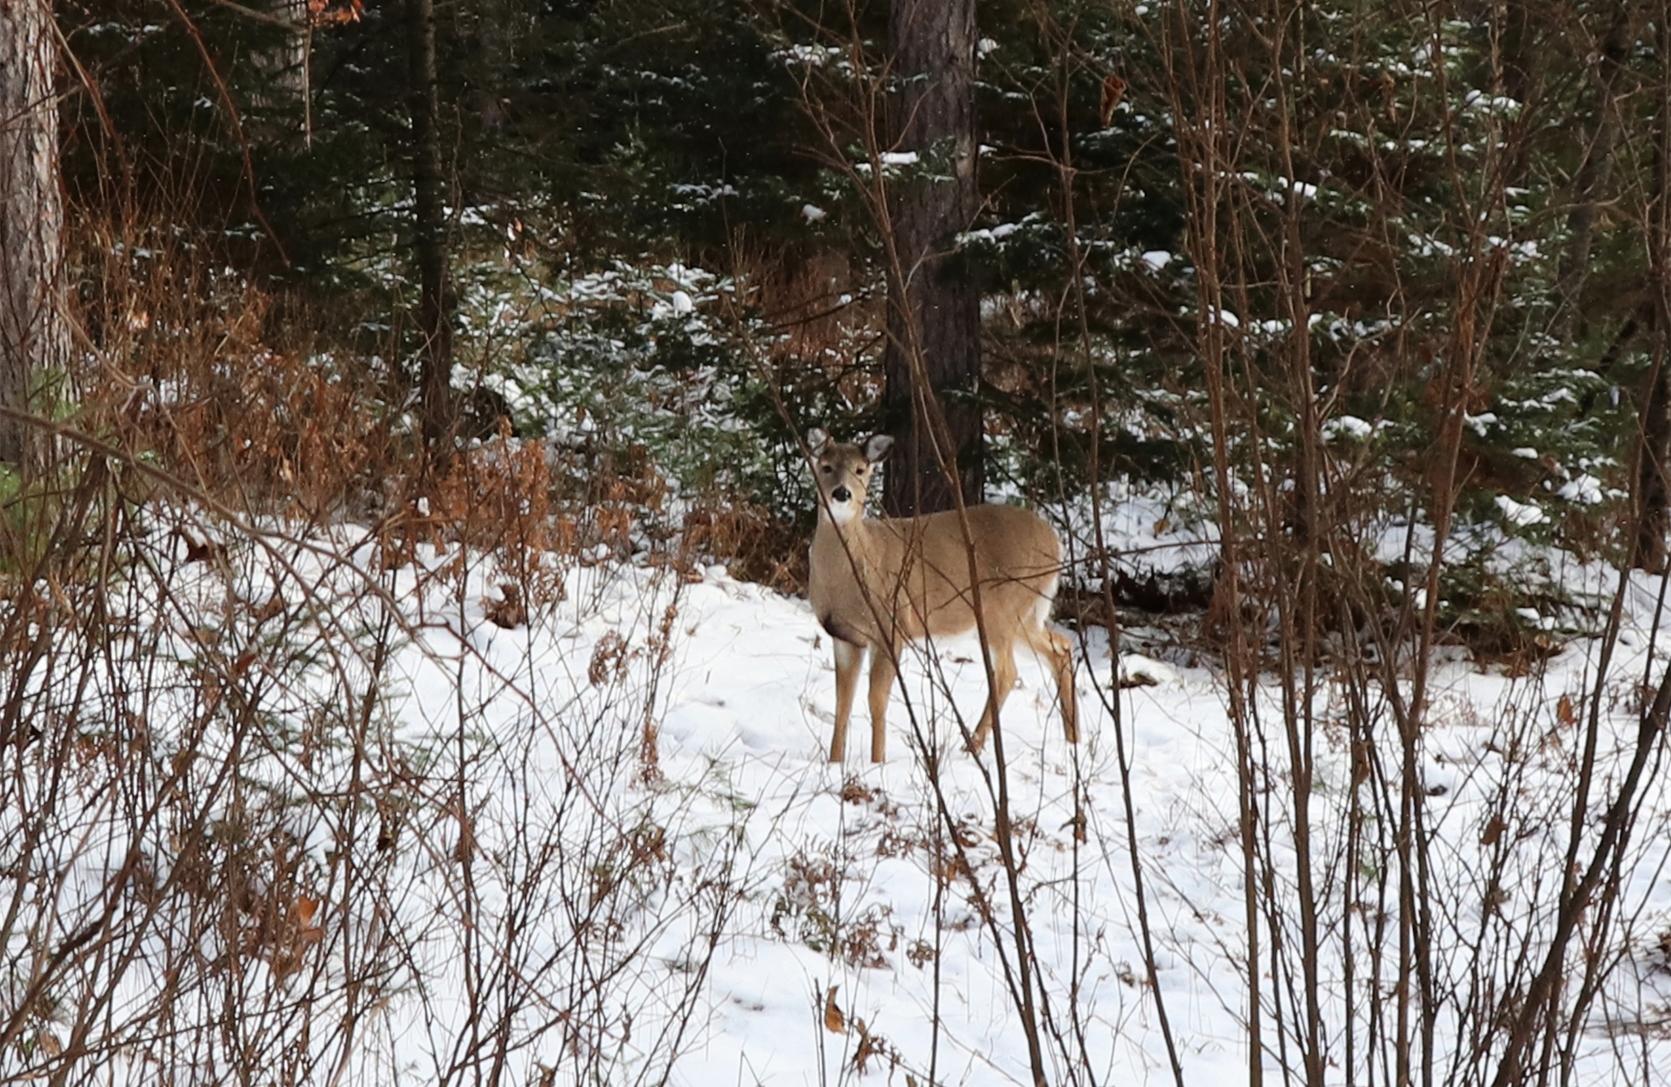 A doe peers through the brush in Hazelhurst. Kim Johnson photo